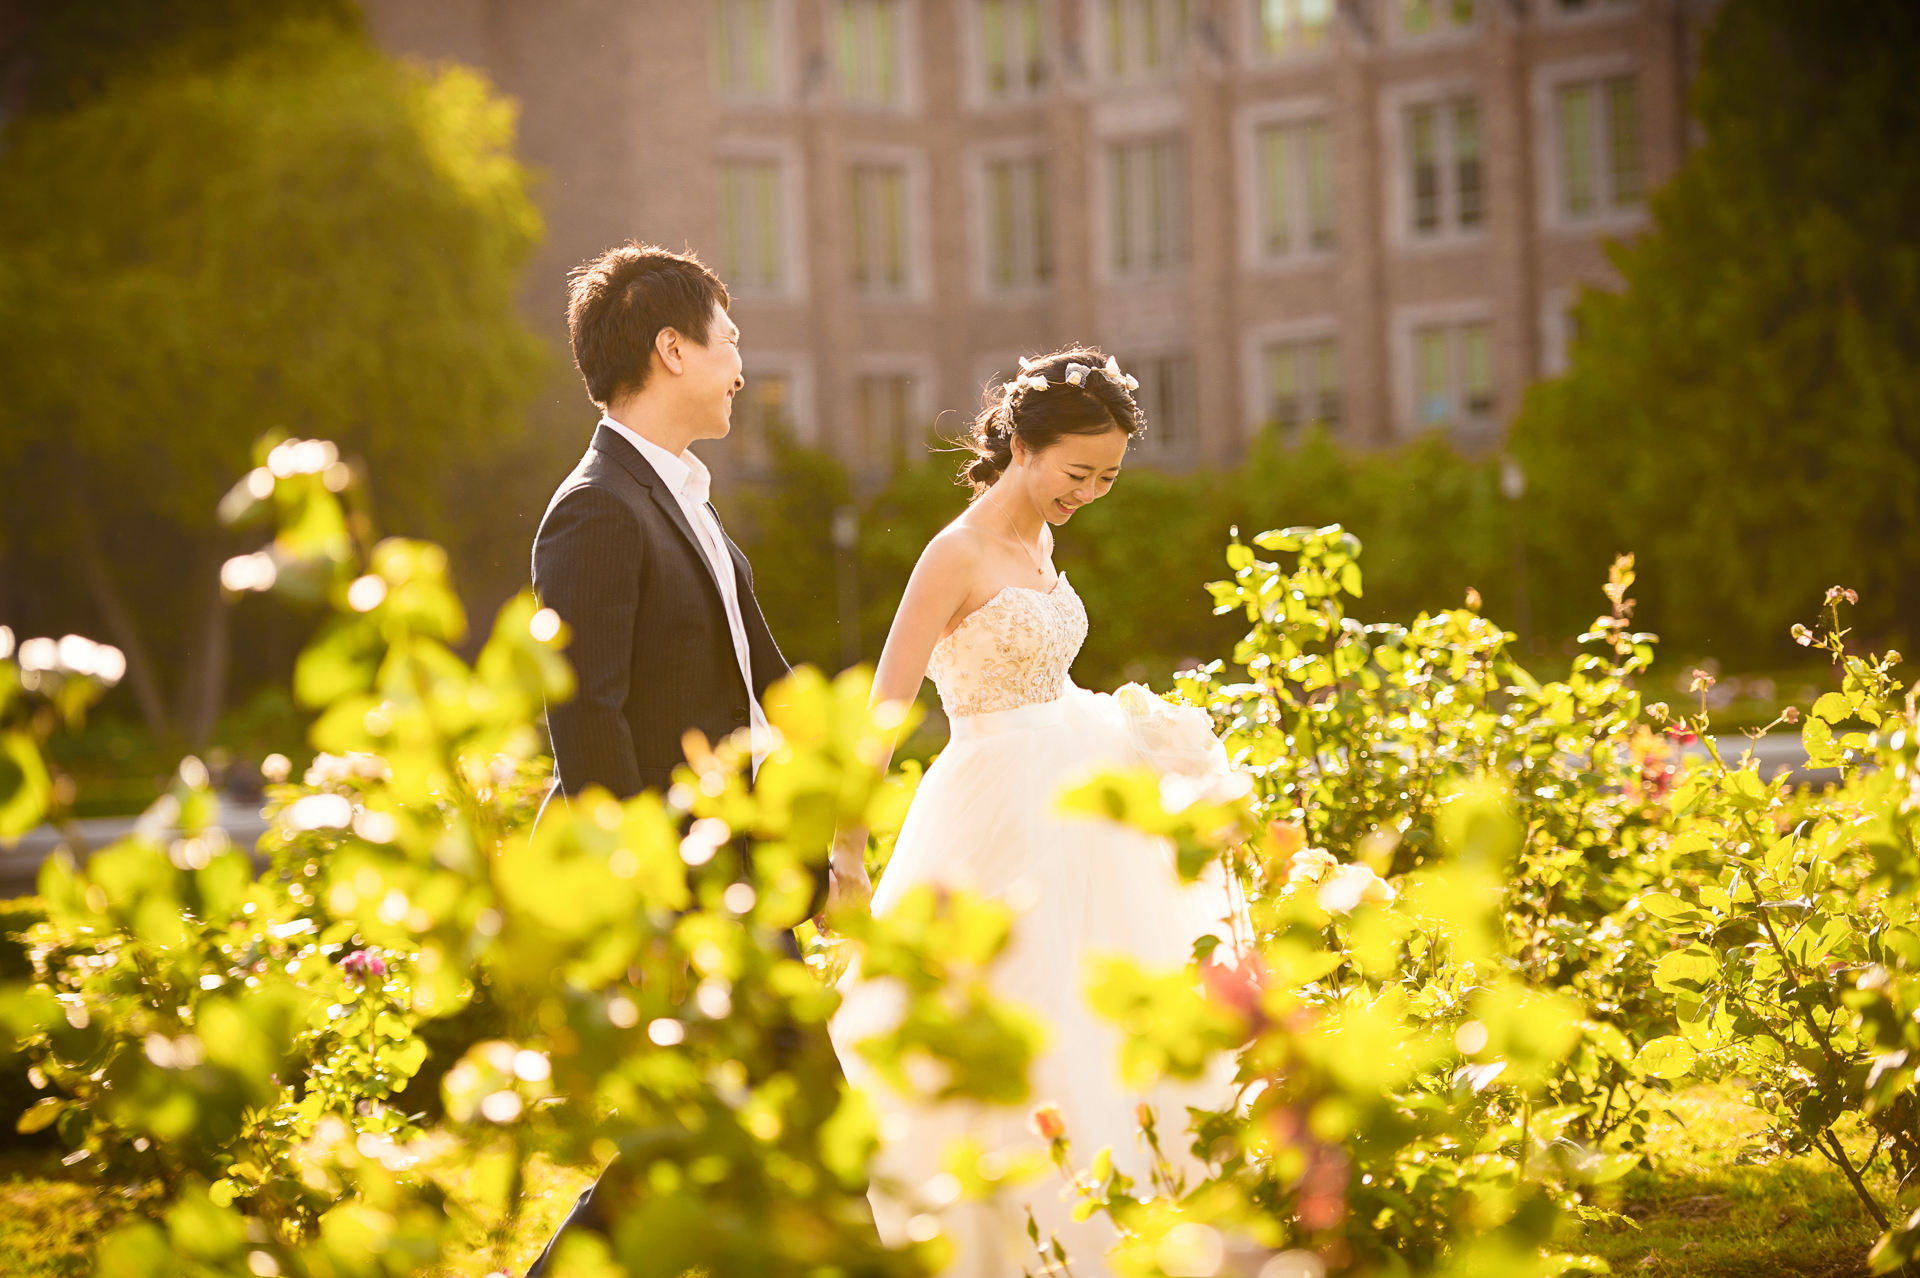 university of washington pre wedding 西雅图华大婚纱照